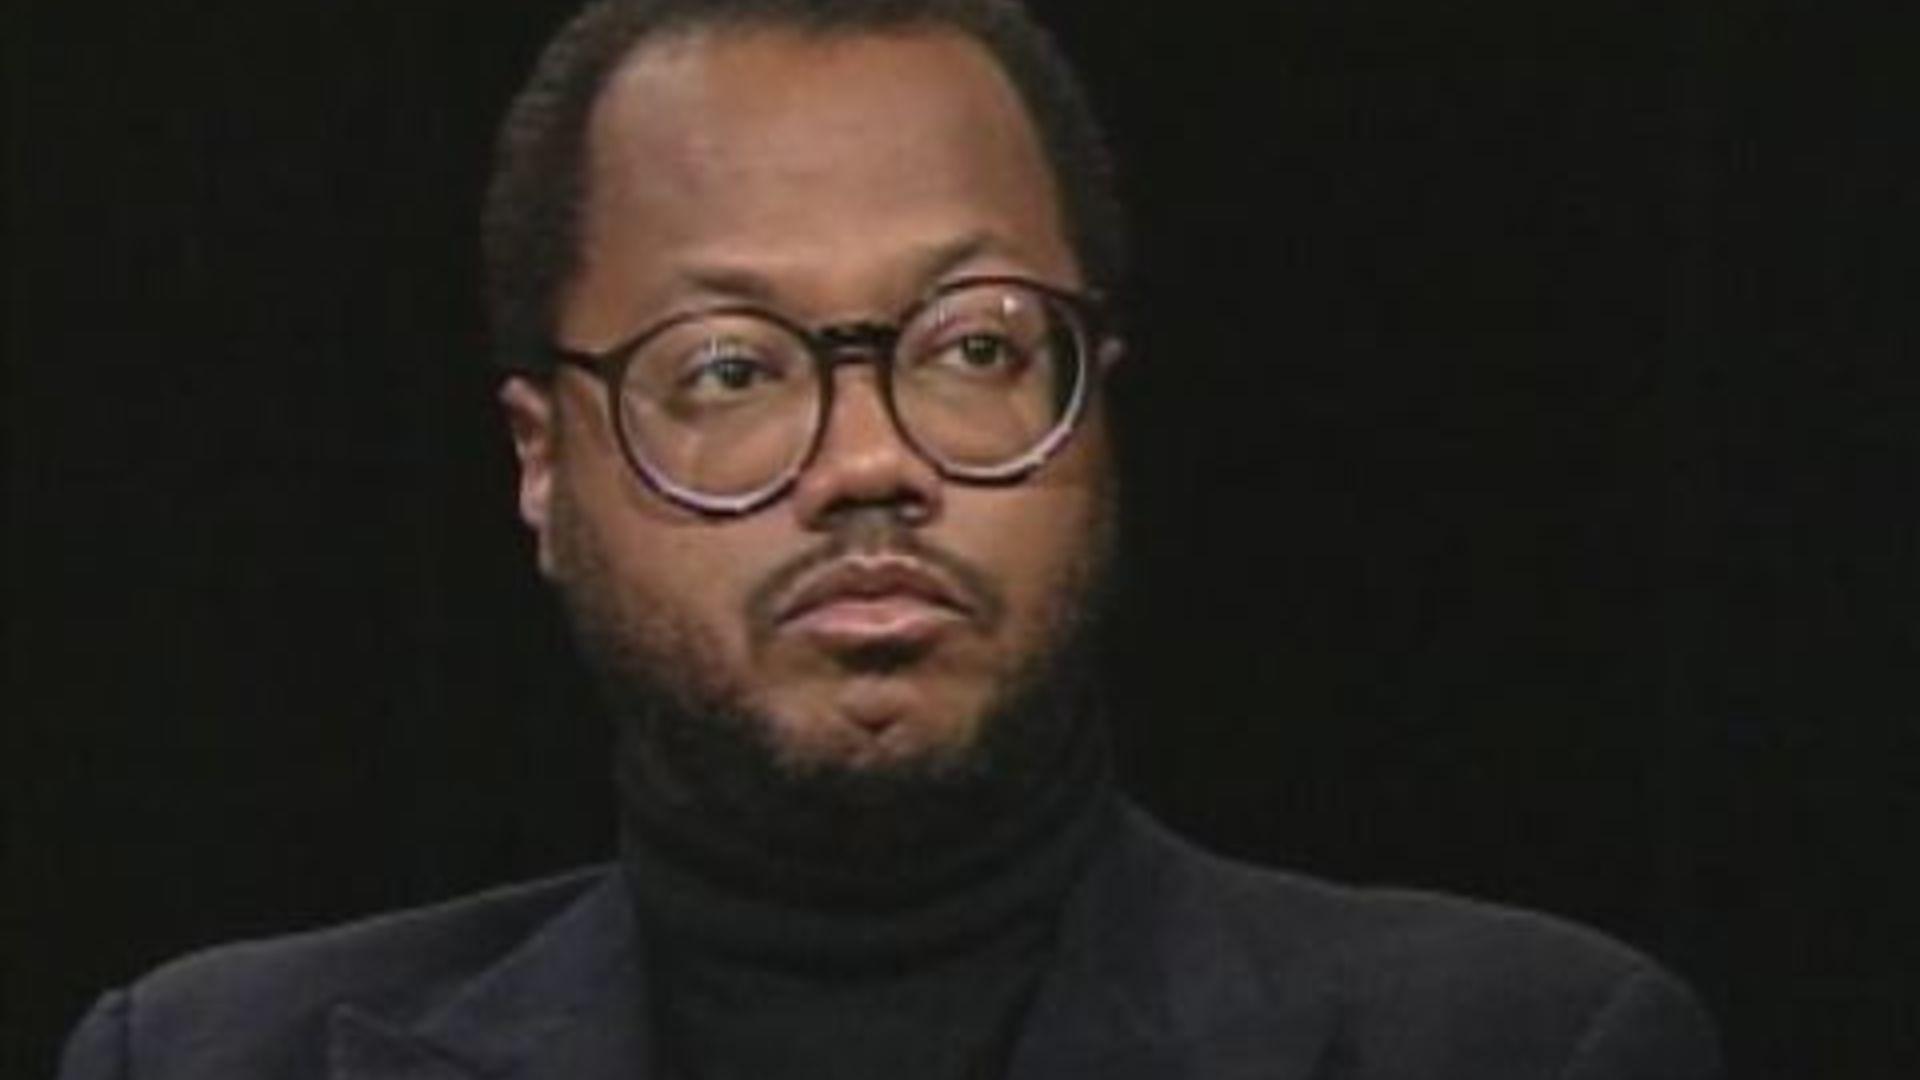 black men and public space essay